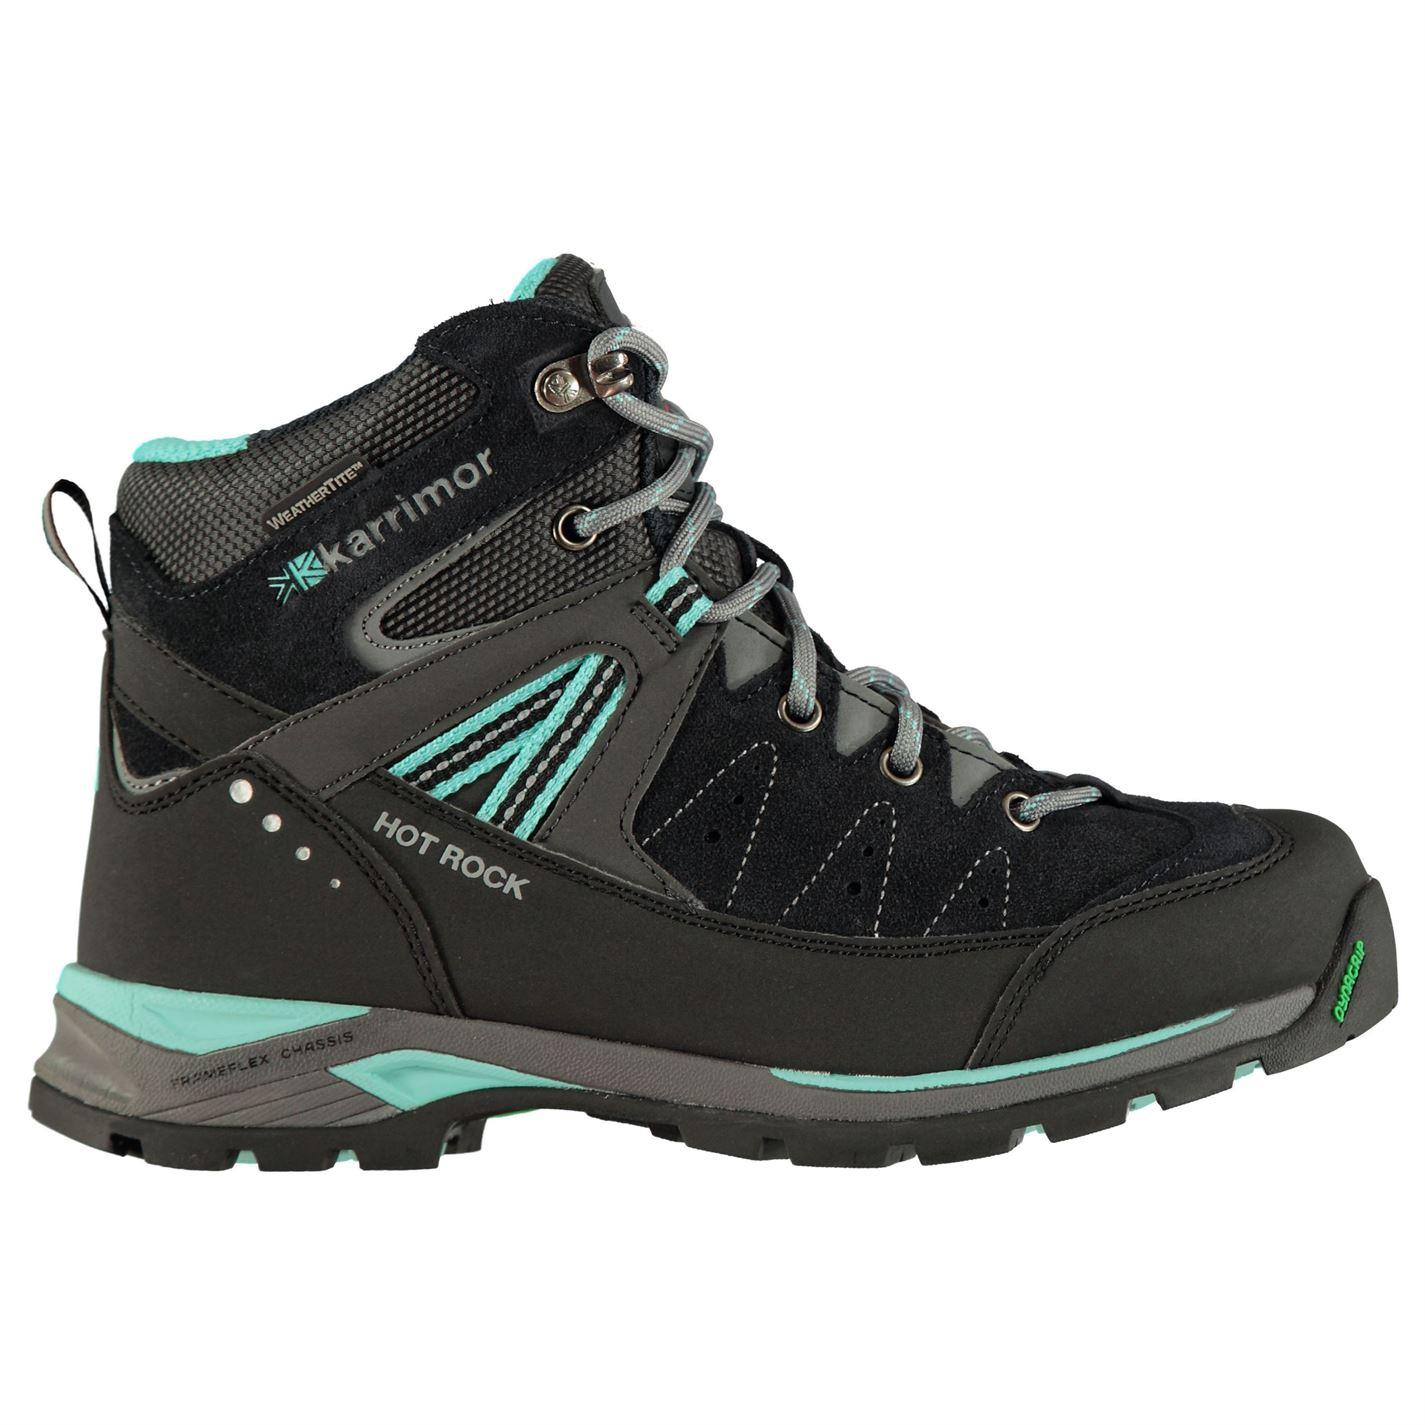 553d83ebf8 Karrimor Hot Rock Junior Walking Boots